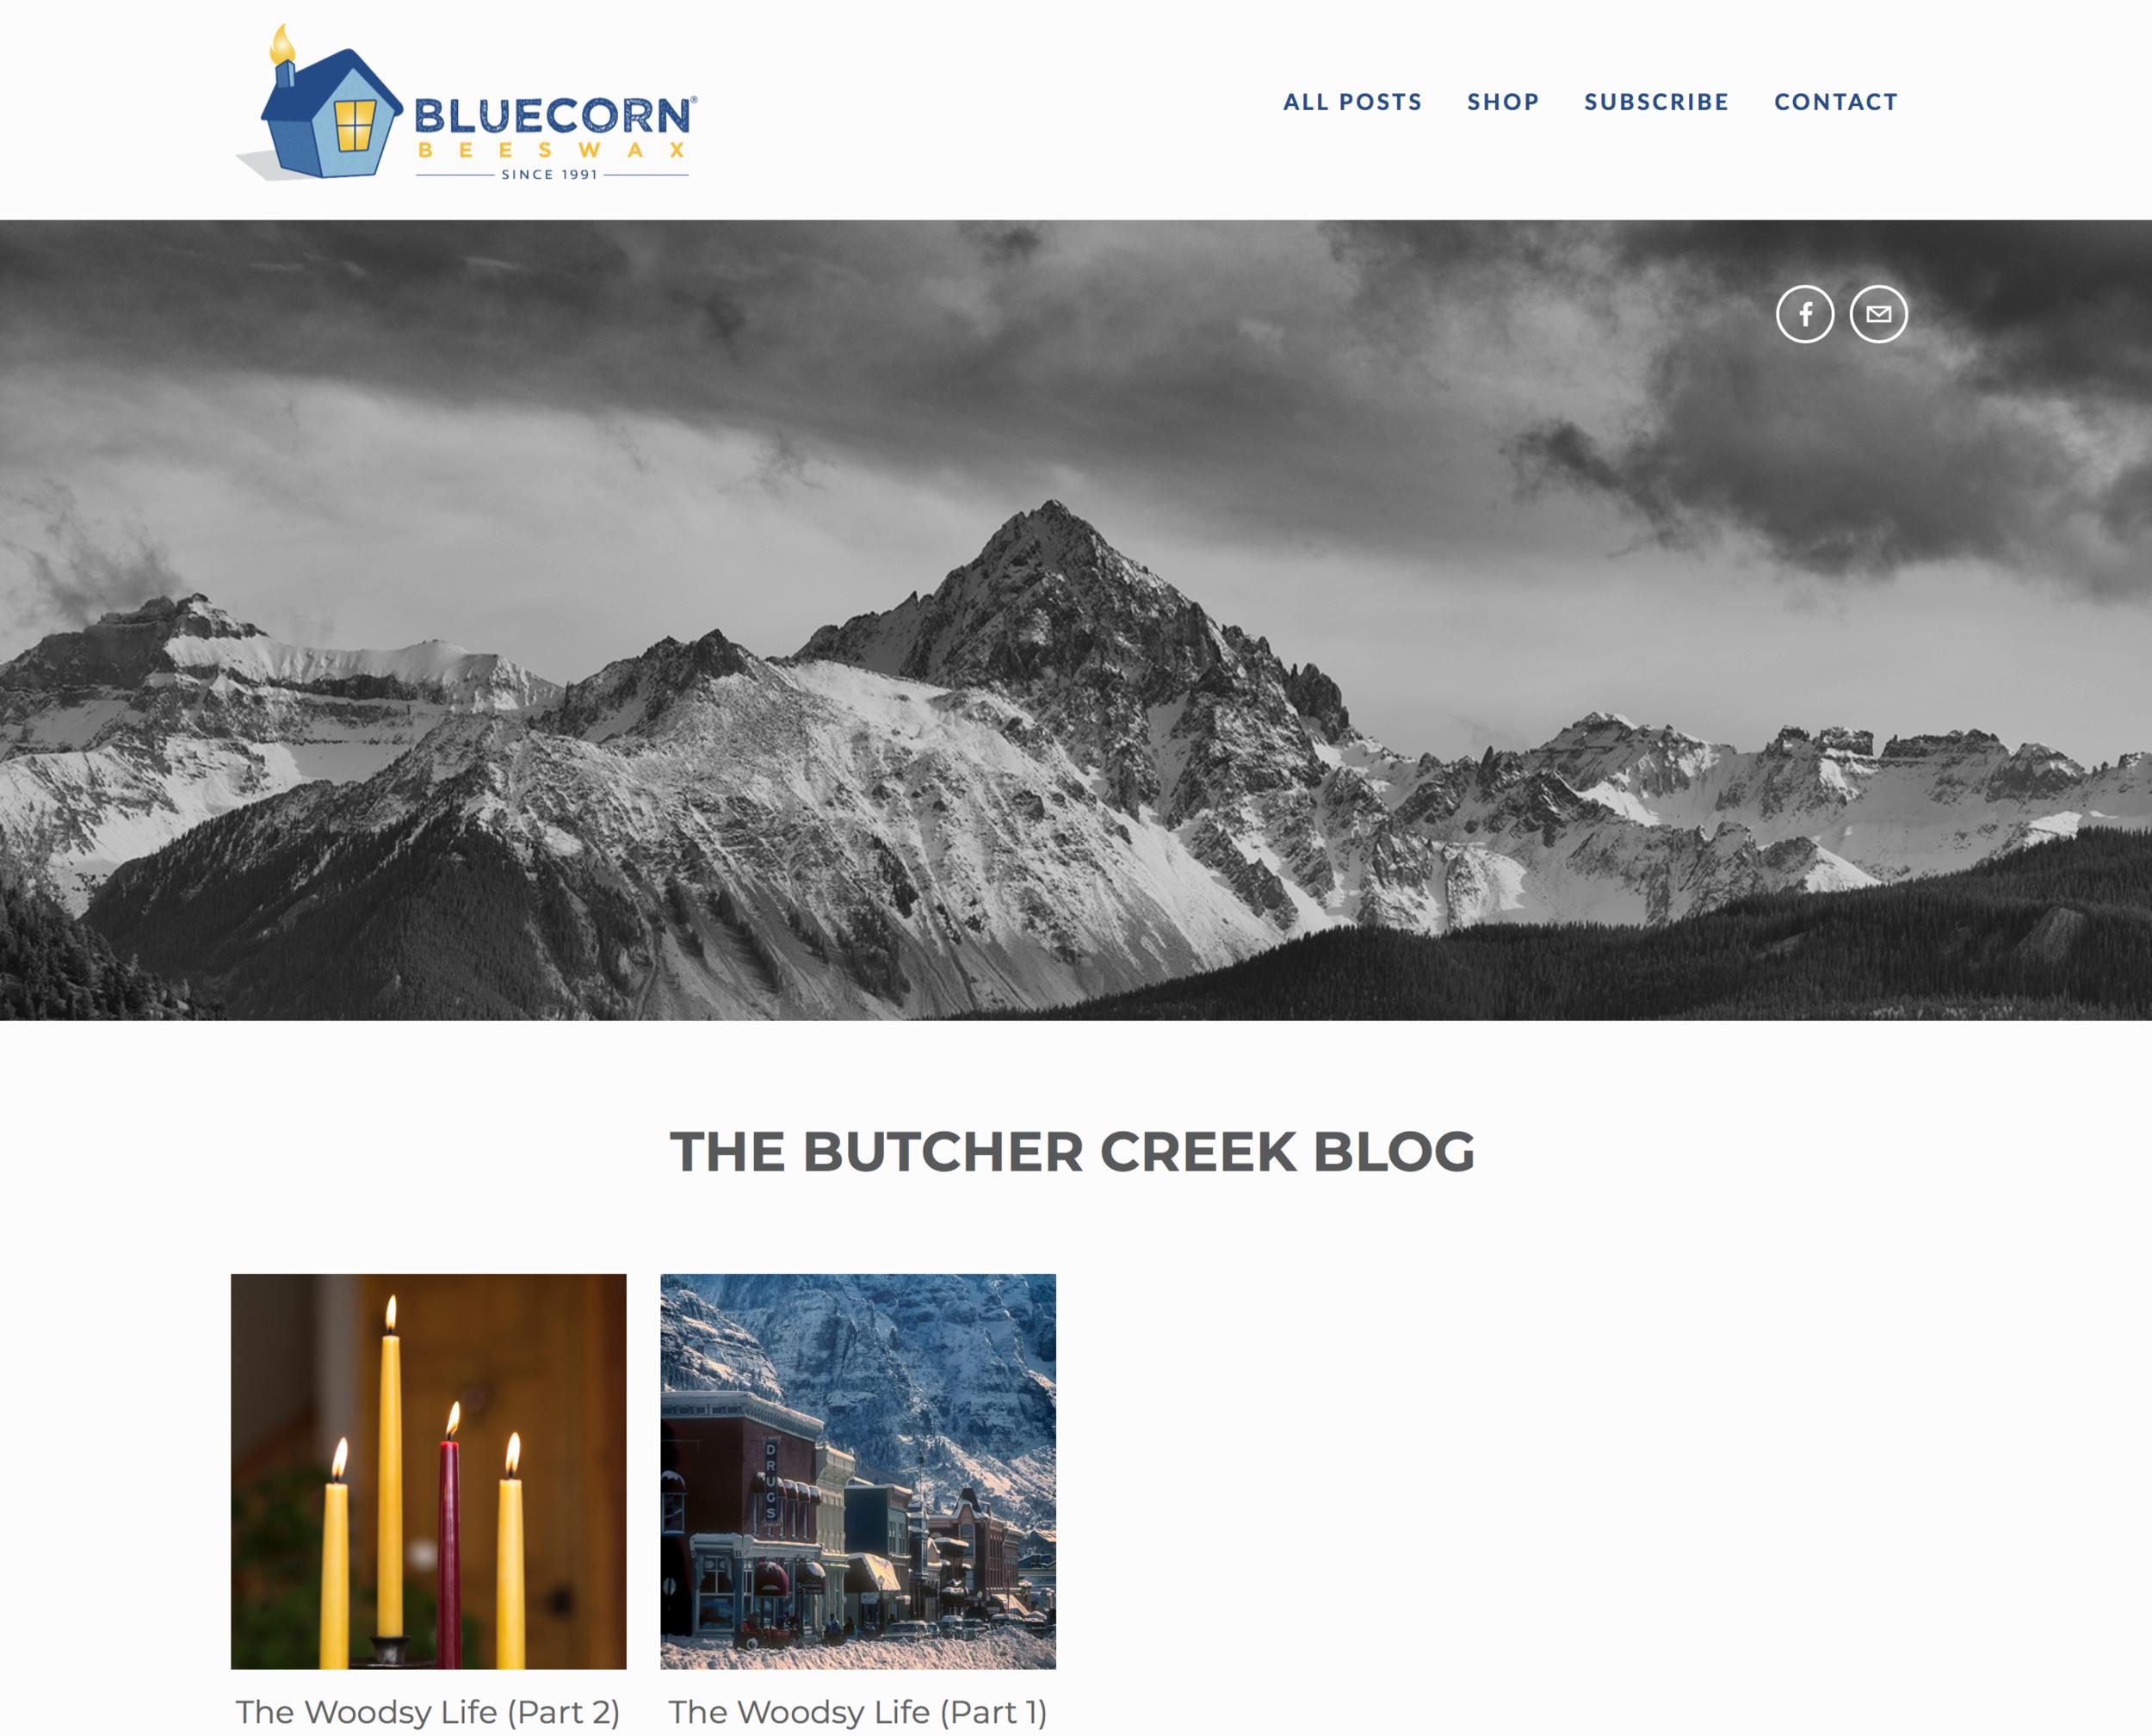 Bluecorn Beeswax Blog Site